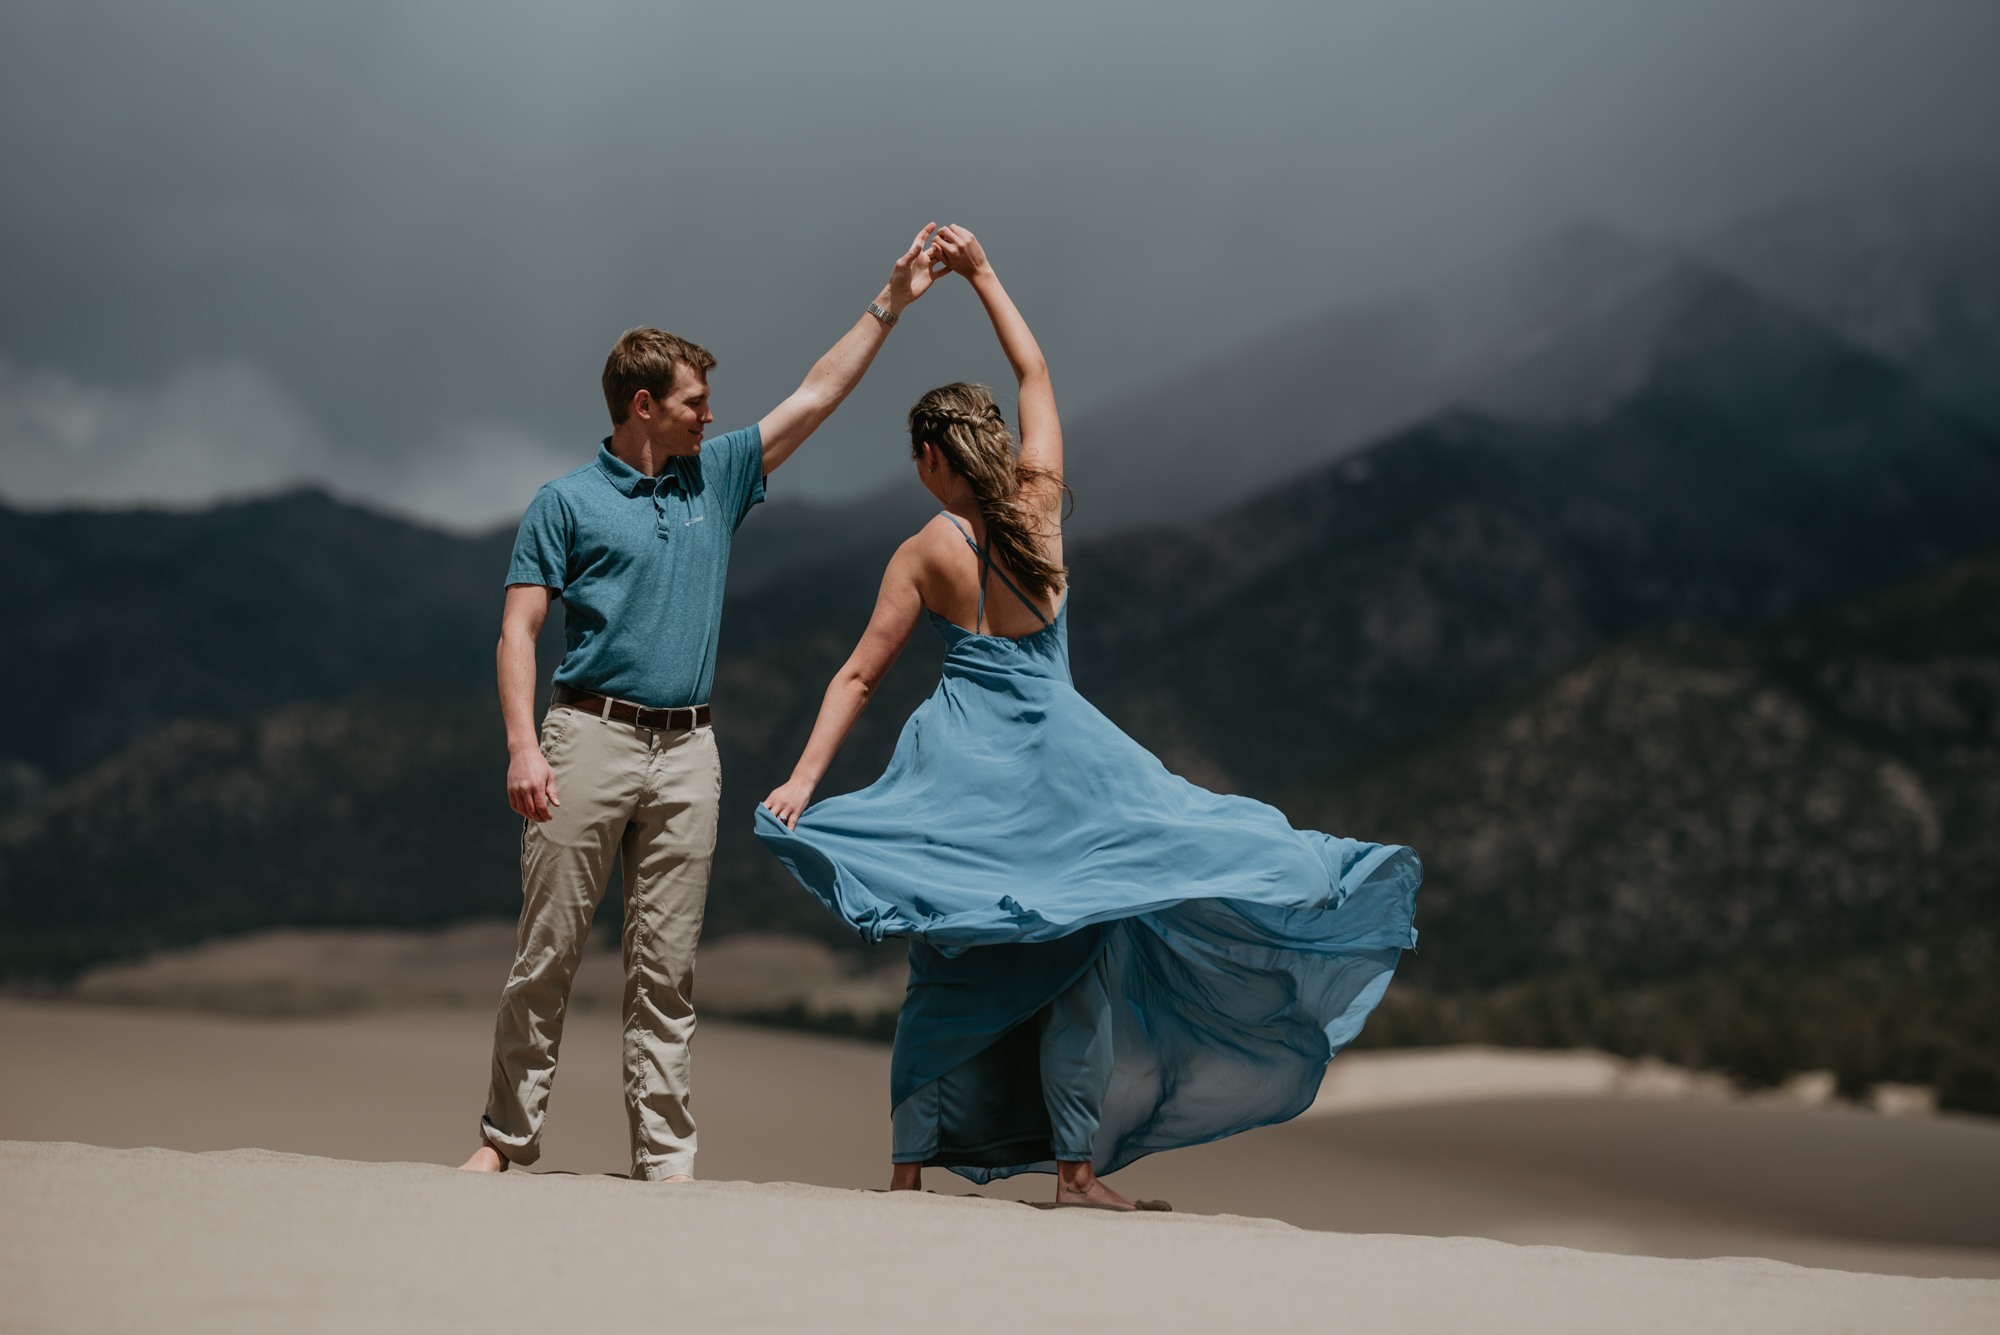 Brittany's blue dress twirls in the wind.